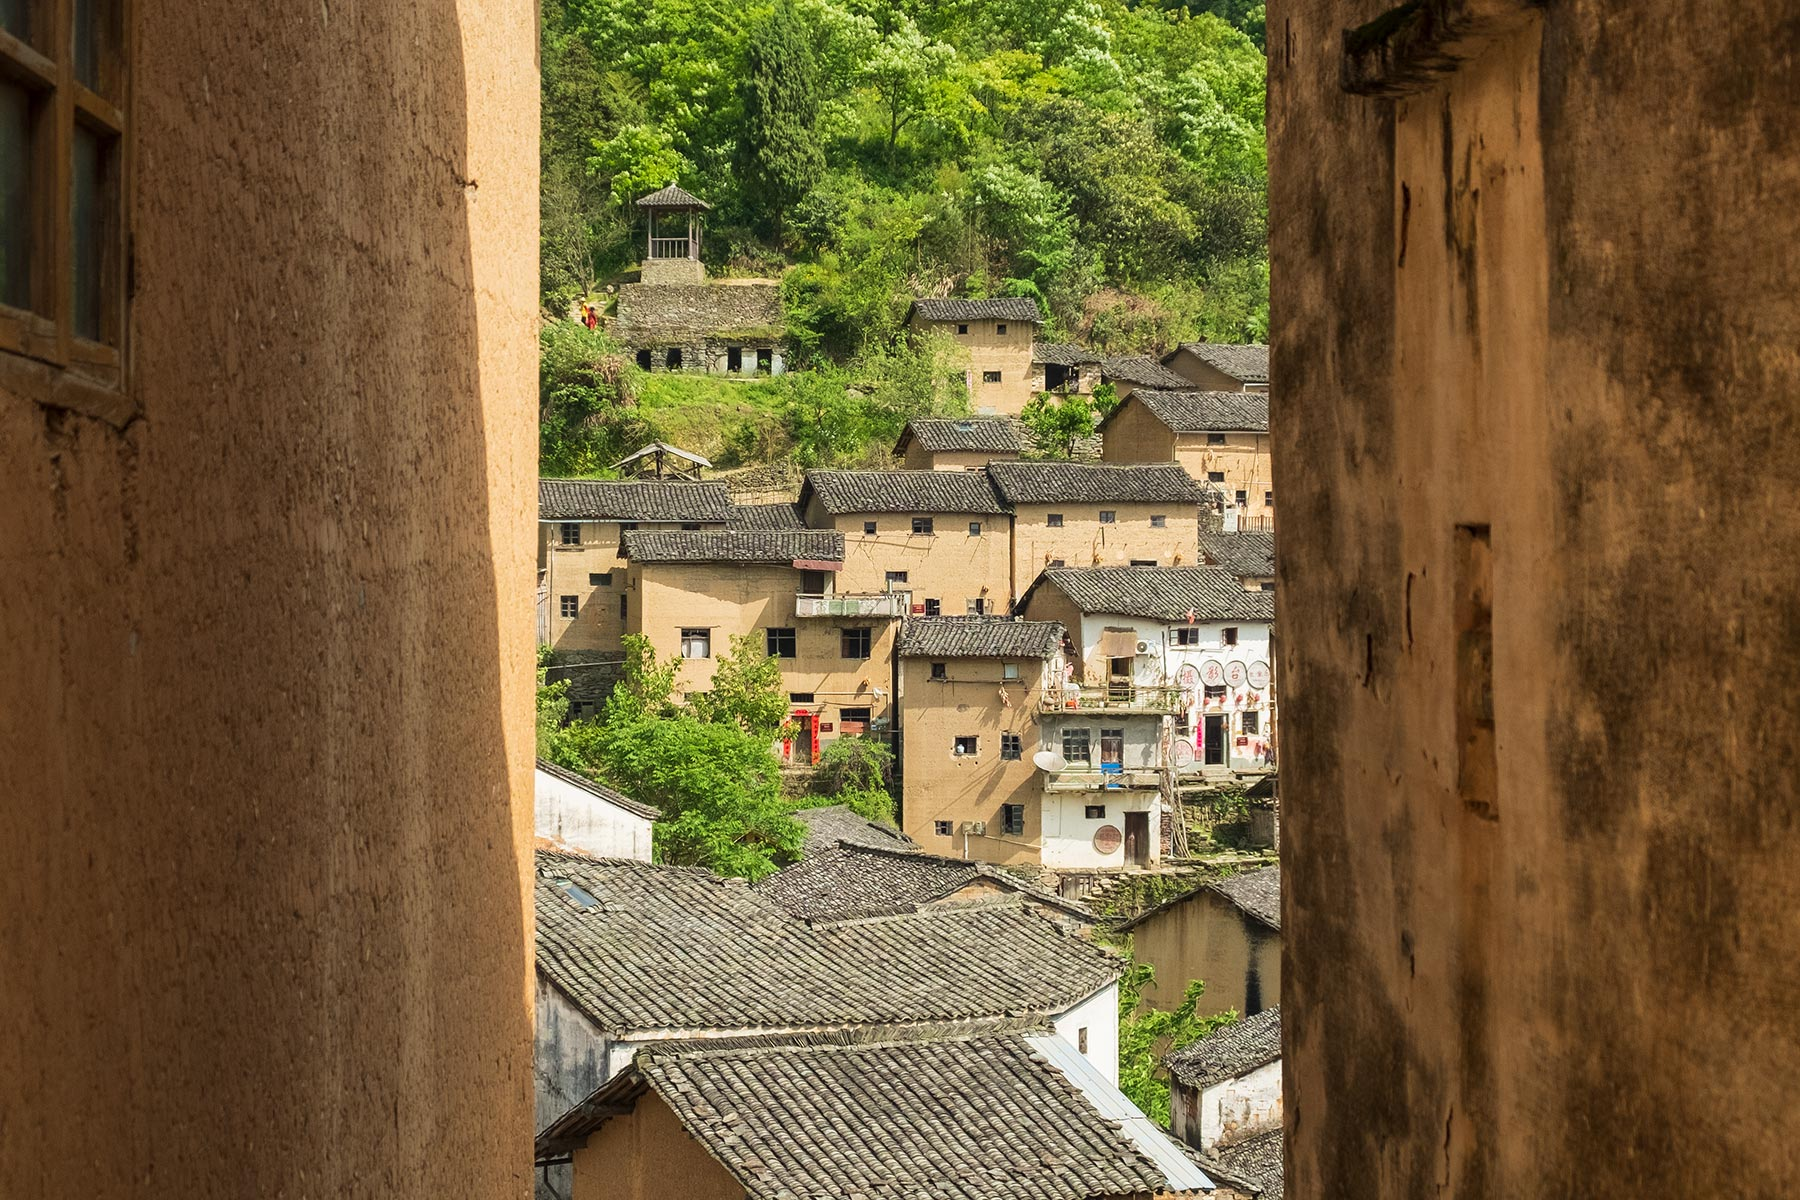 Yangchan Tulou 阳产土楼 Erdhäuser Dorf in Anhui, China